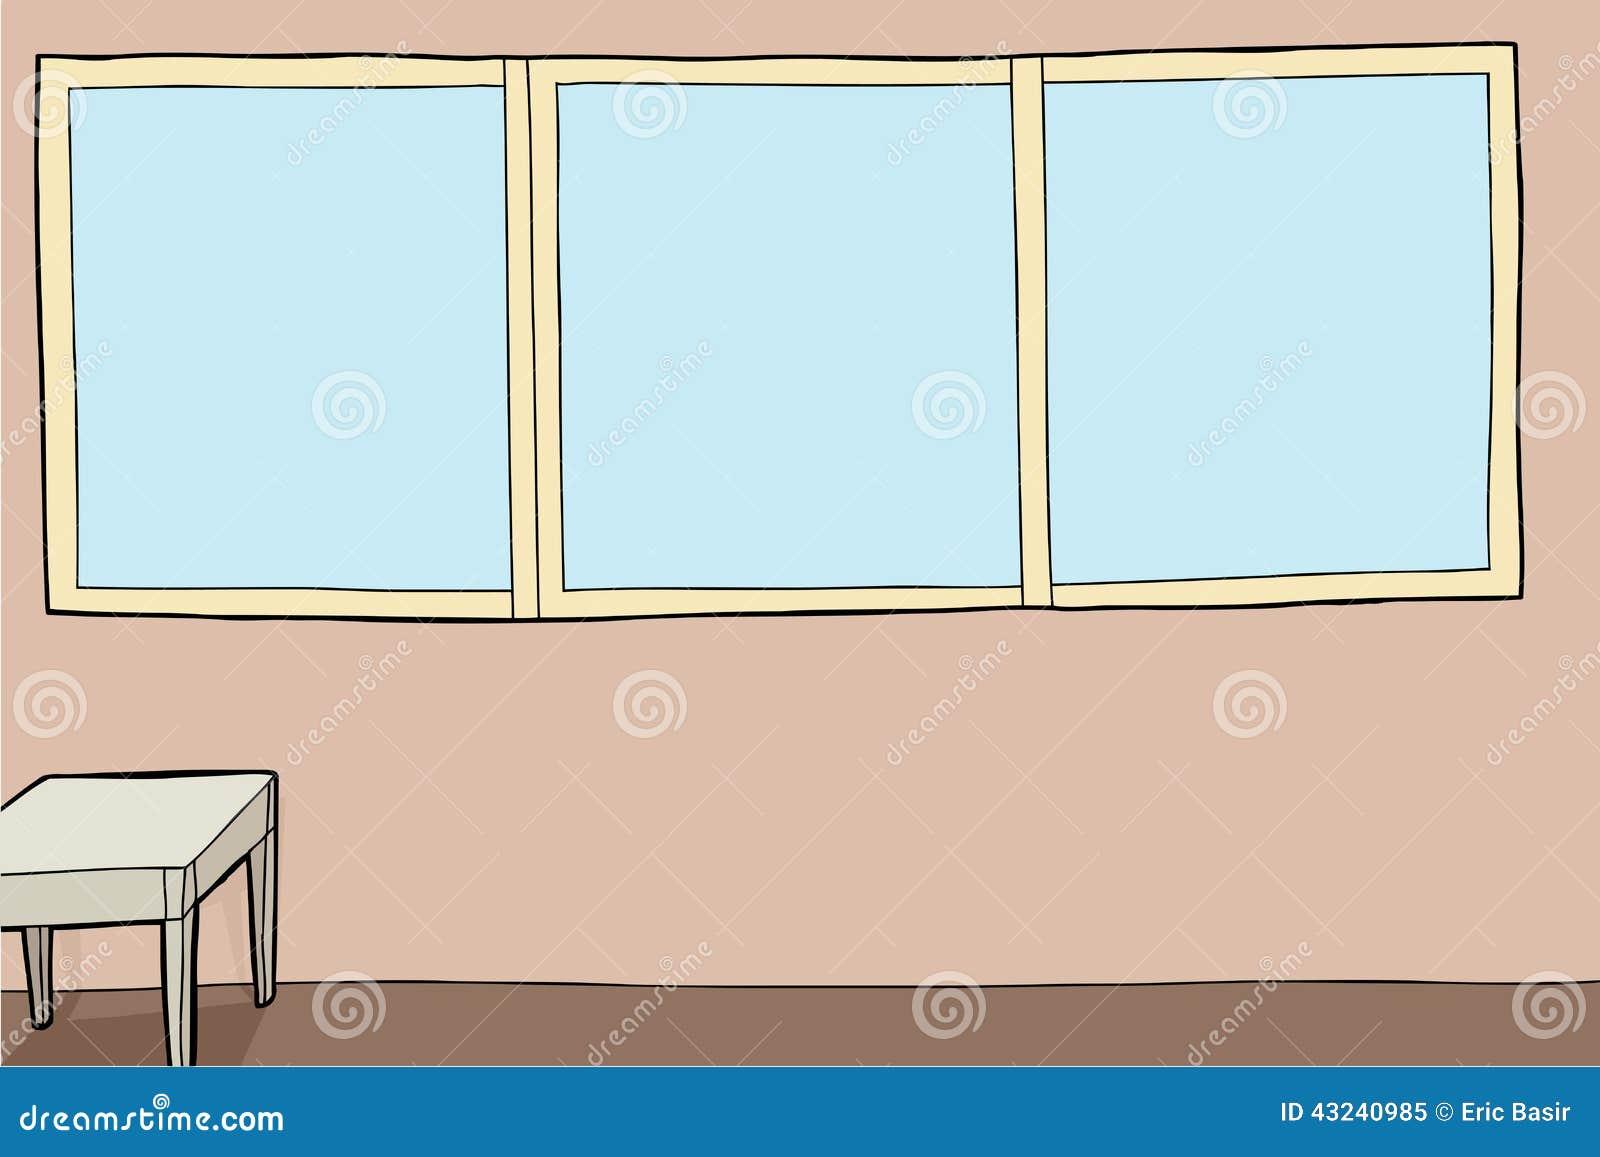 generic room with nightstand stock vector image 43240985